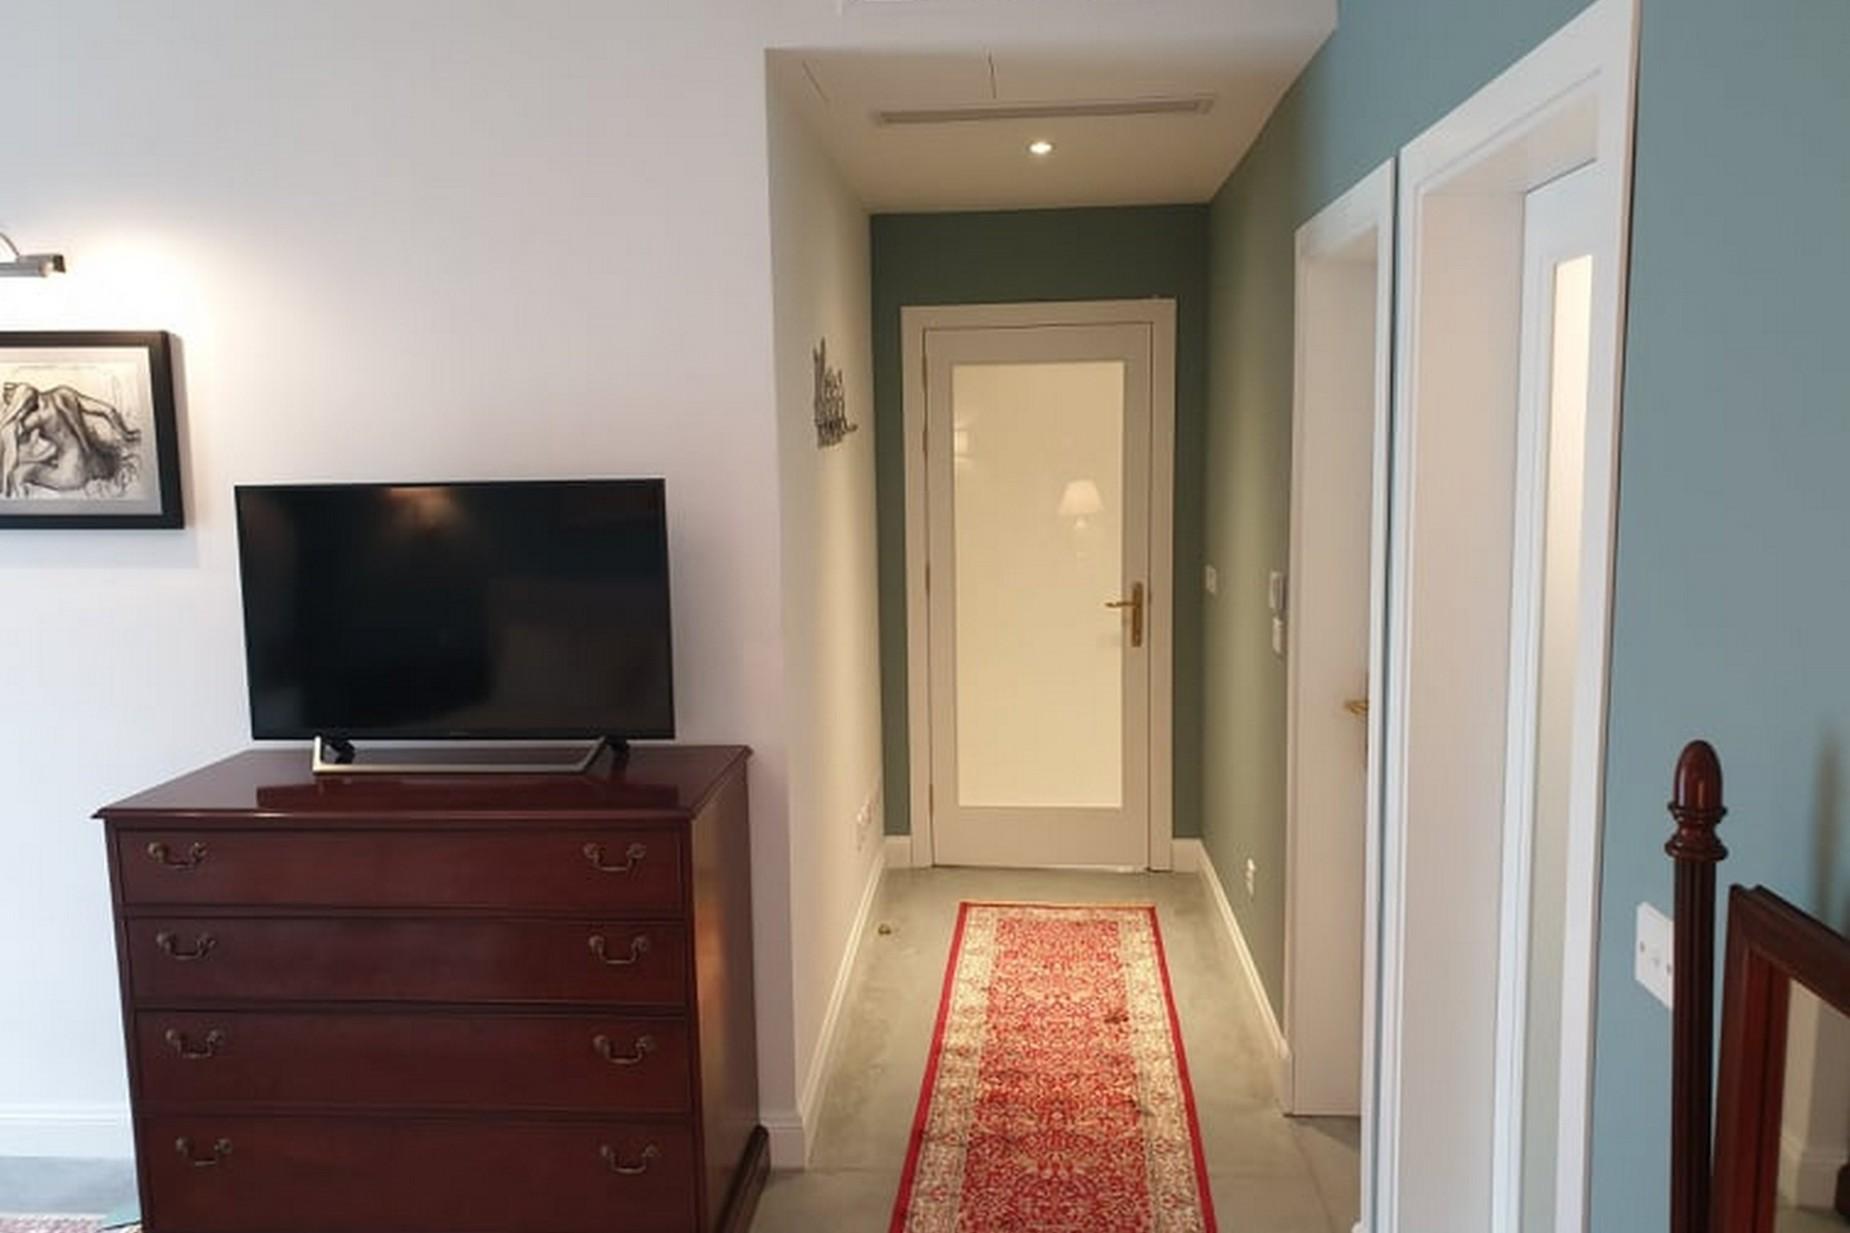 3 bed Apartment For Rent in Birkirkara, Birkirkara - thumb 23